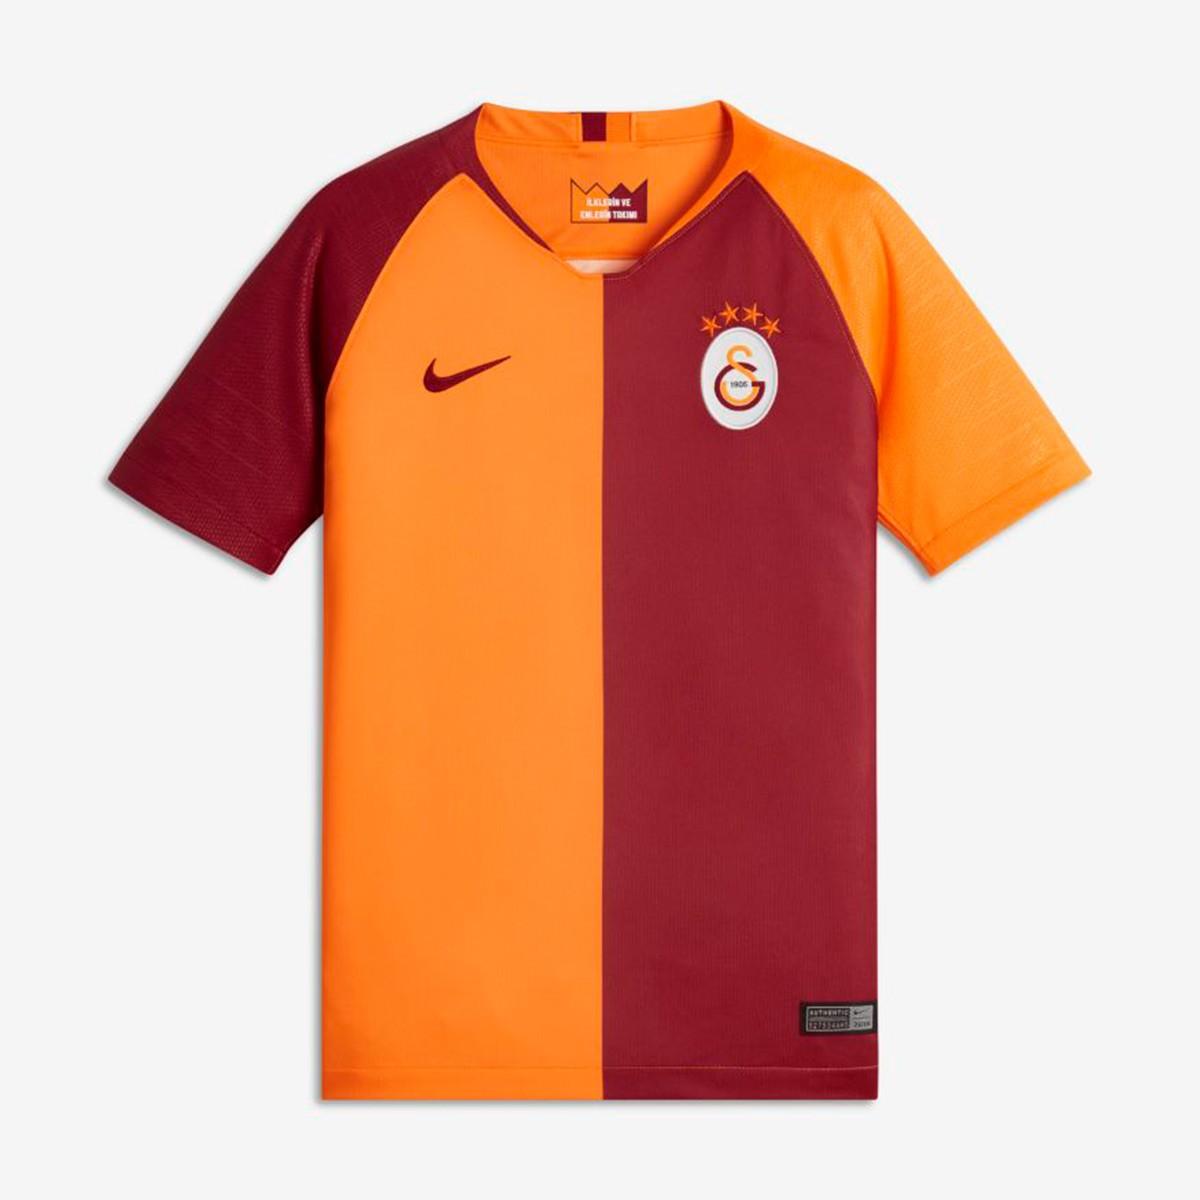 29ad869279f Nike Kids Galatasaray Stadium 2018-2019 Home Jersey. Vivid orange-Pepper red  ...